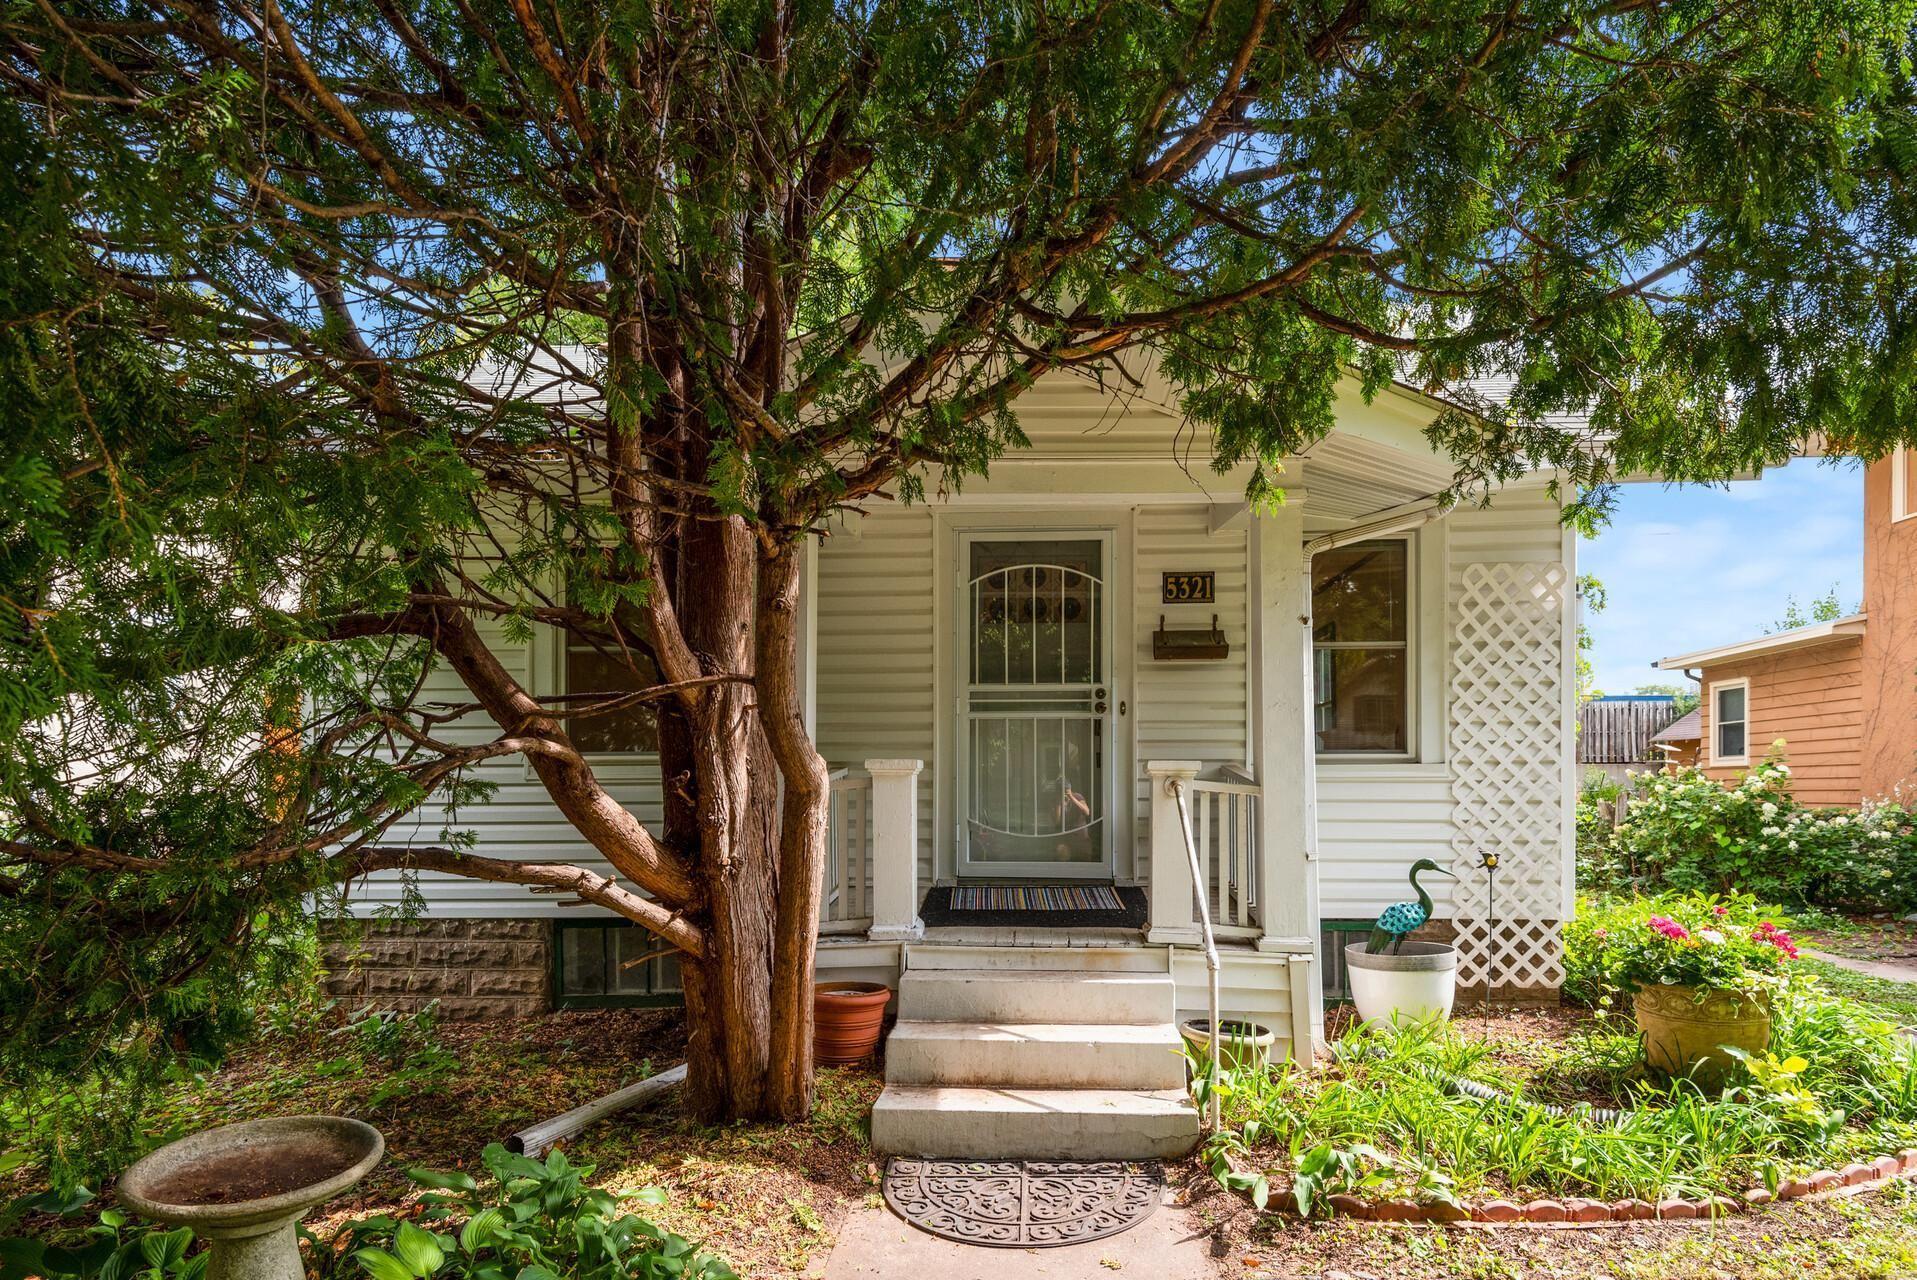 Photo of 5321 Aldrich Avenue S, Minneapolis, MN 55419 (MLS # 6098976)